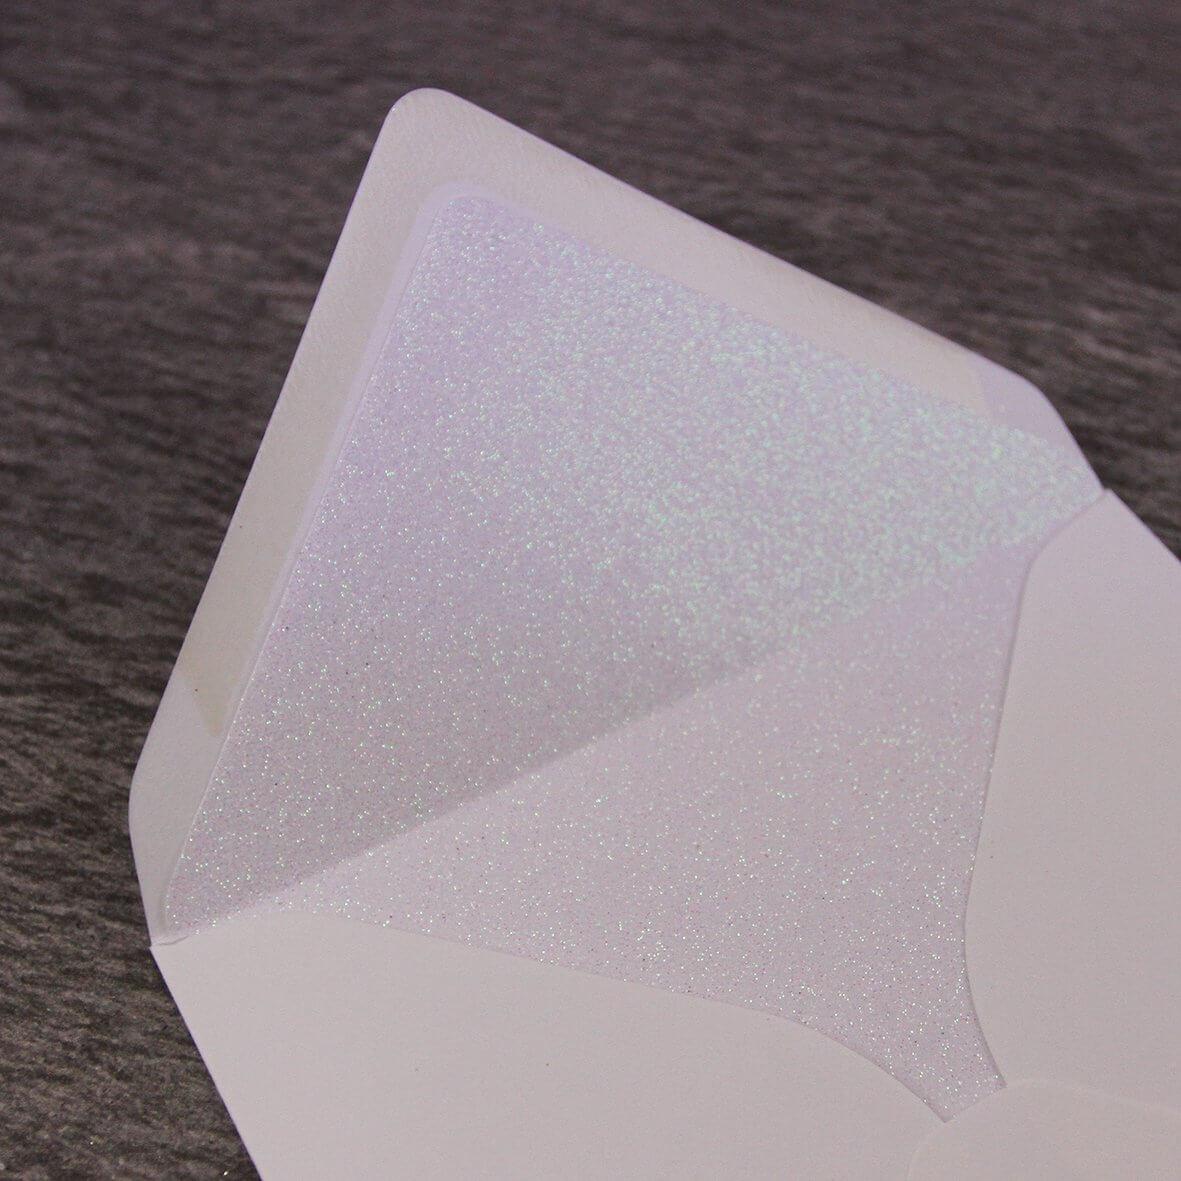 Iridescent White Glitter Paper Envelope Liner - Large Square 155mm - Shown in Ivory Envelope